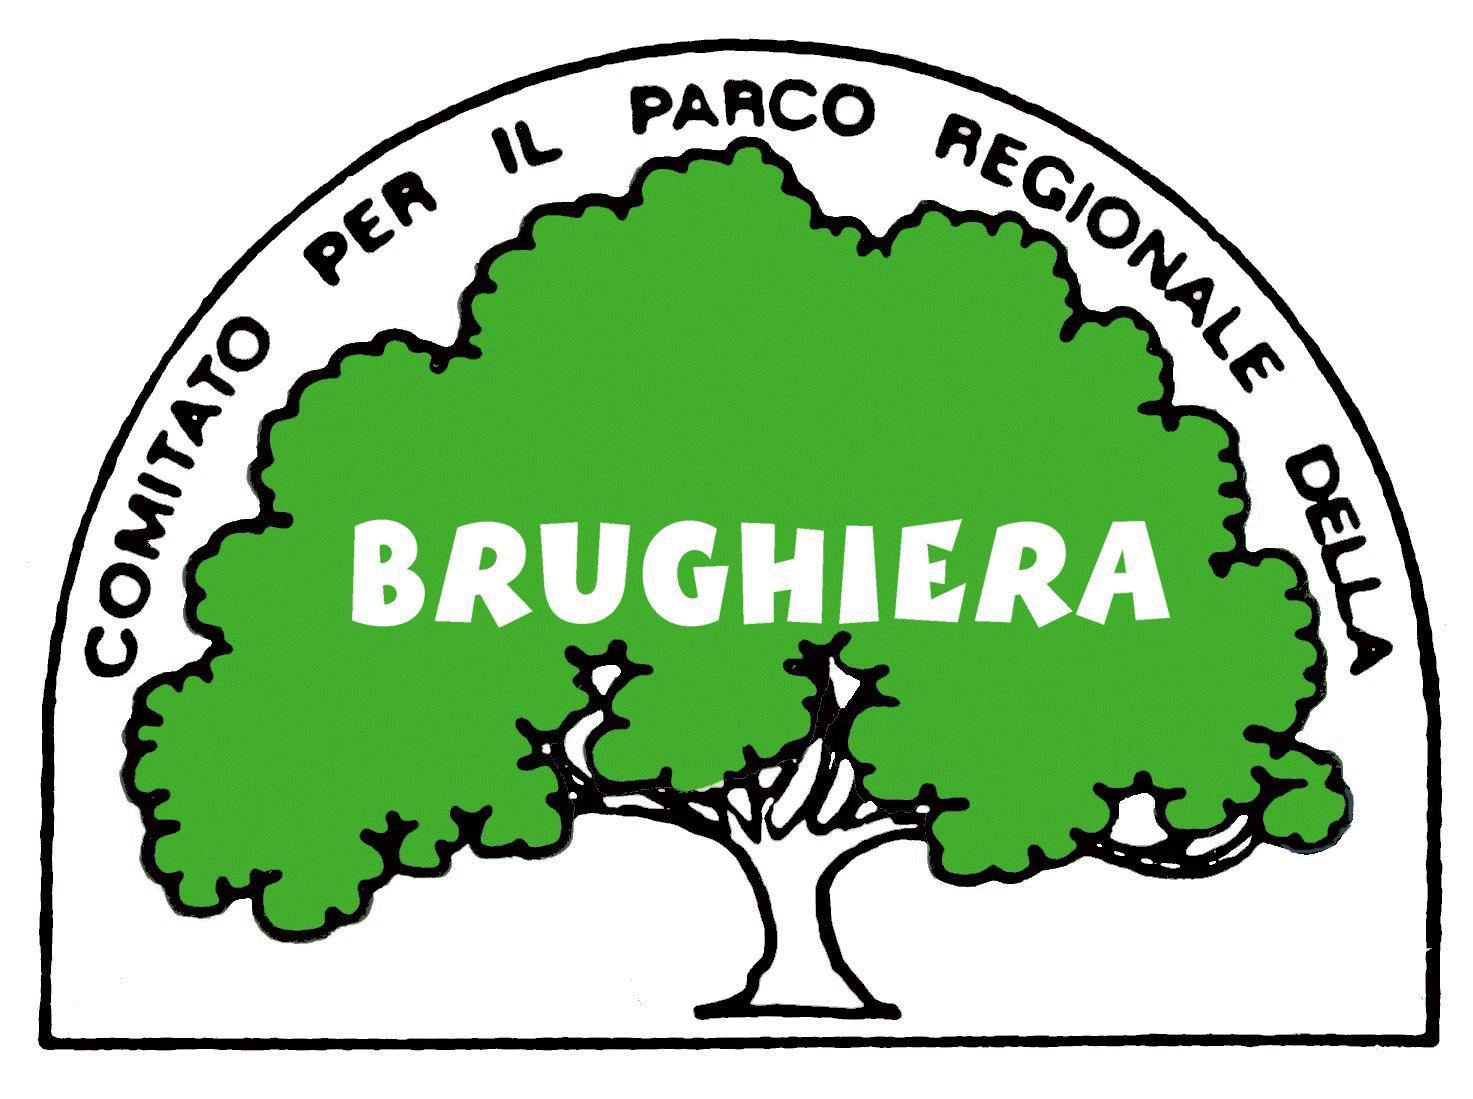 logo comitato parco brughiera